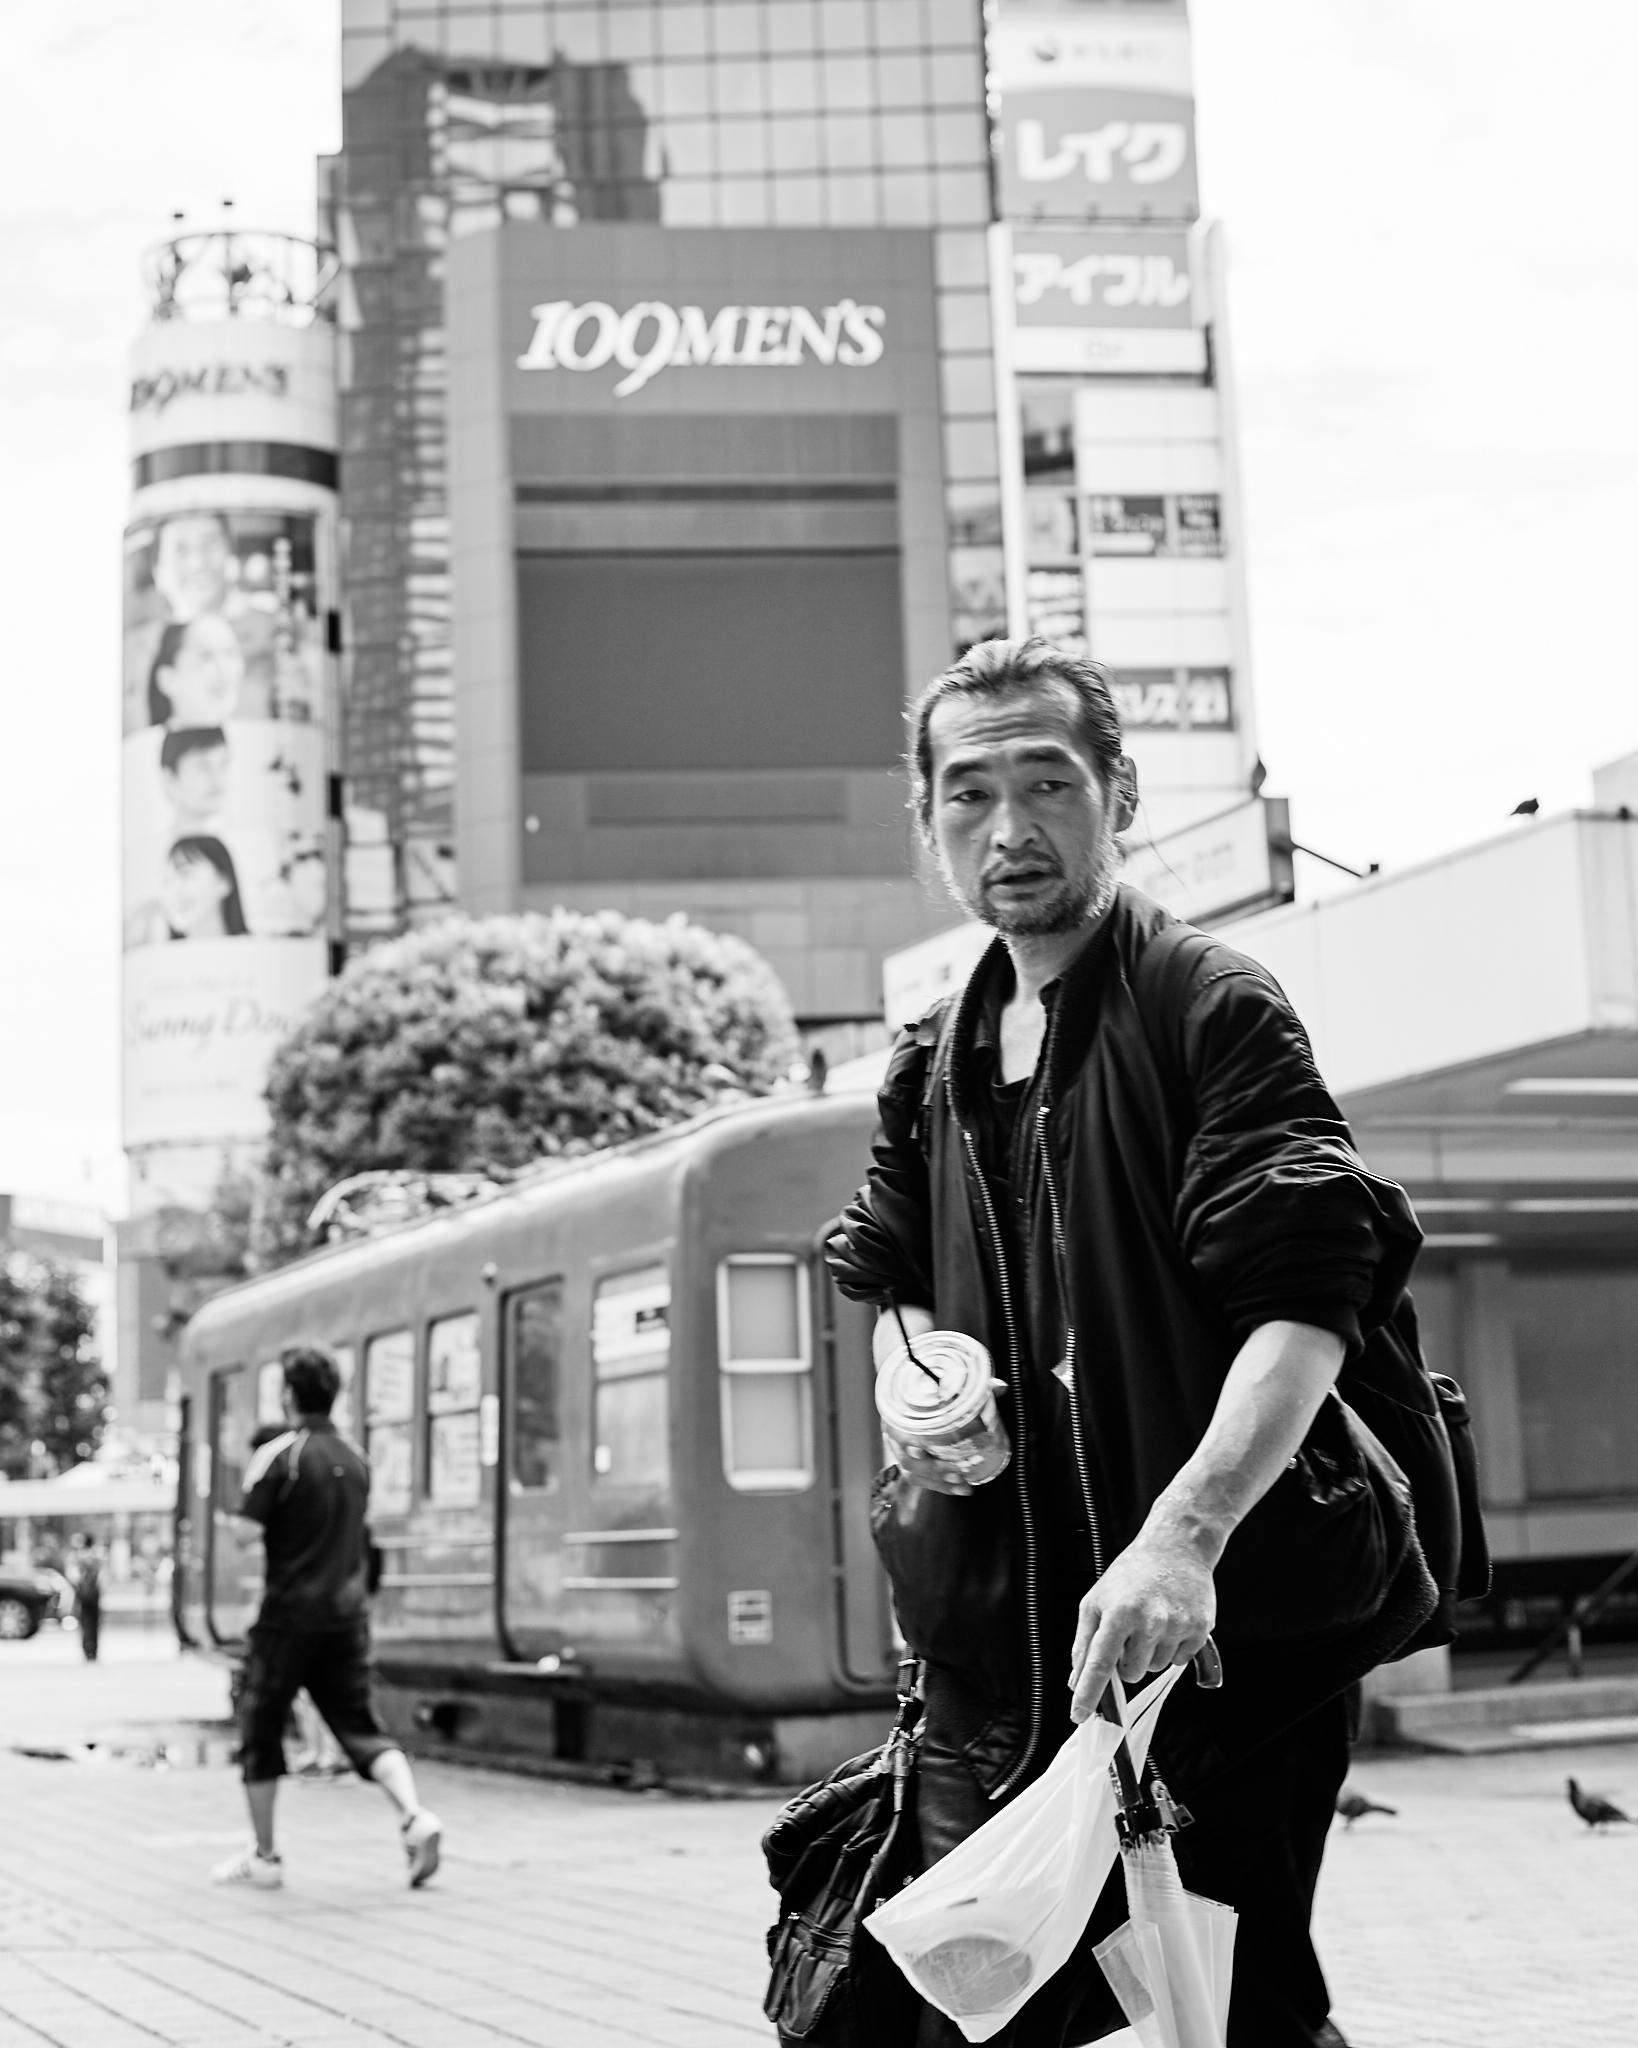 SnapPilots_17-07-01_Tokyo2017_bnw_17.jpg